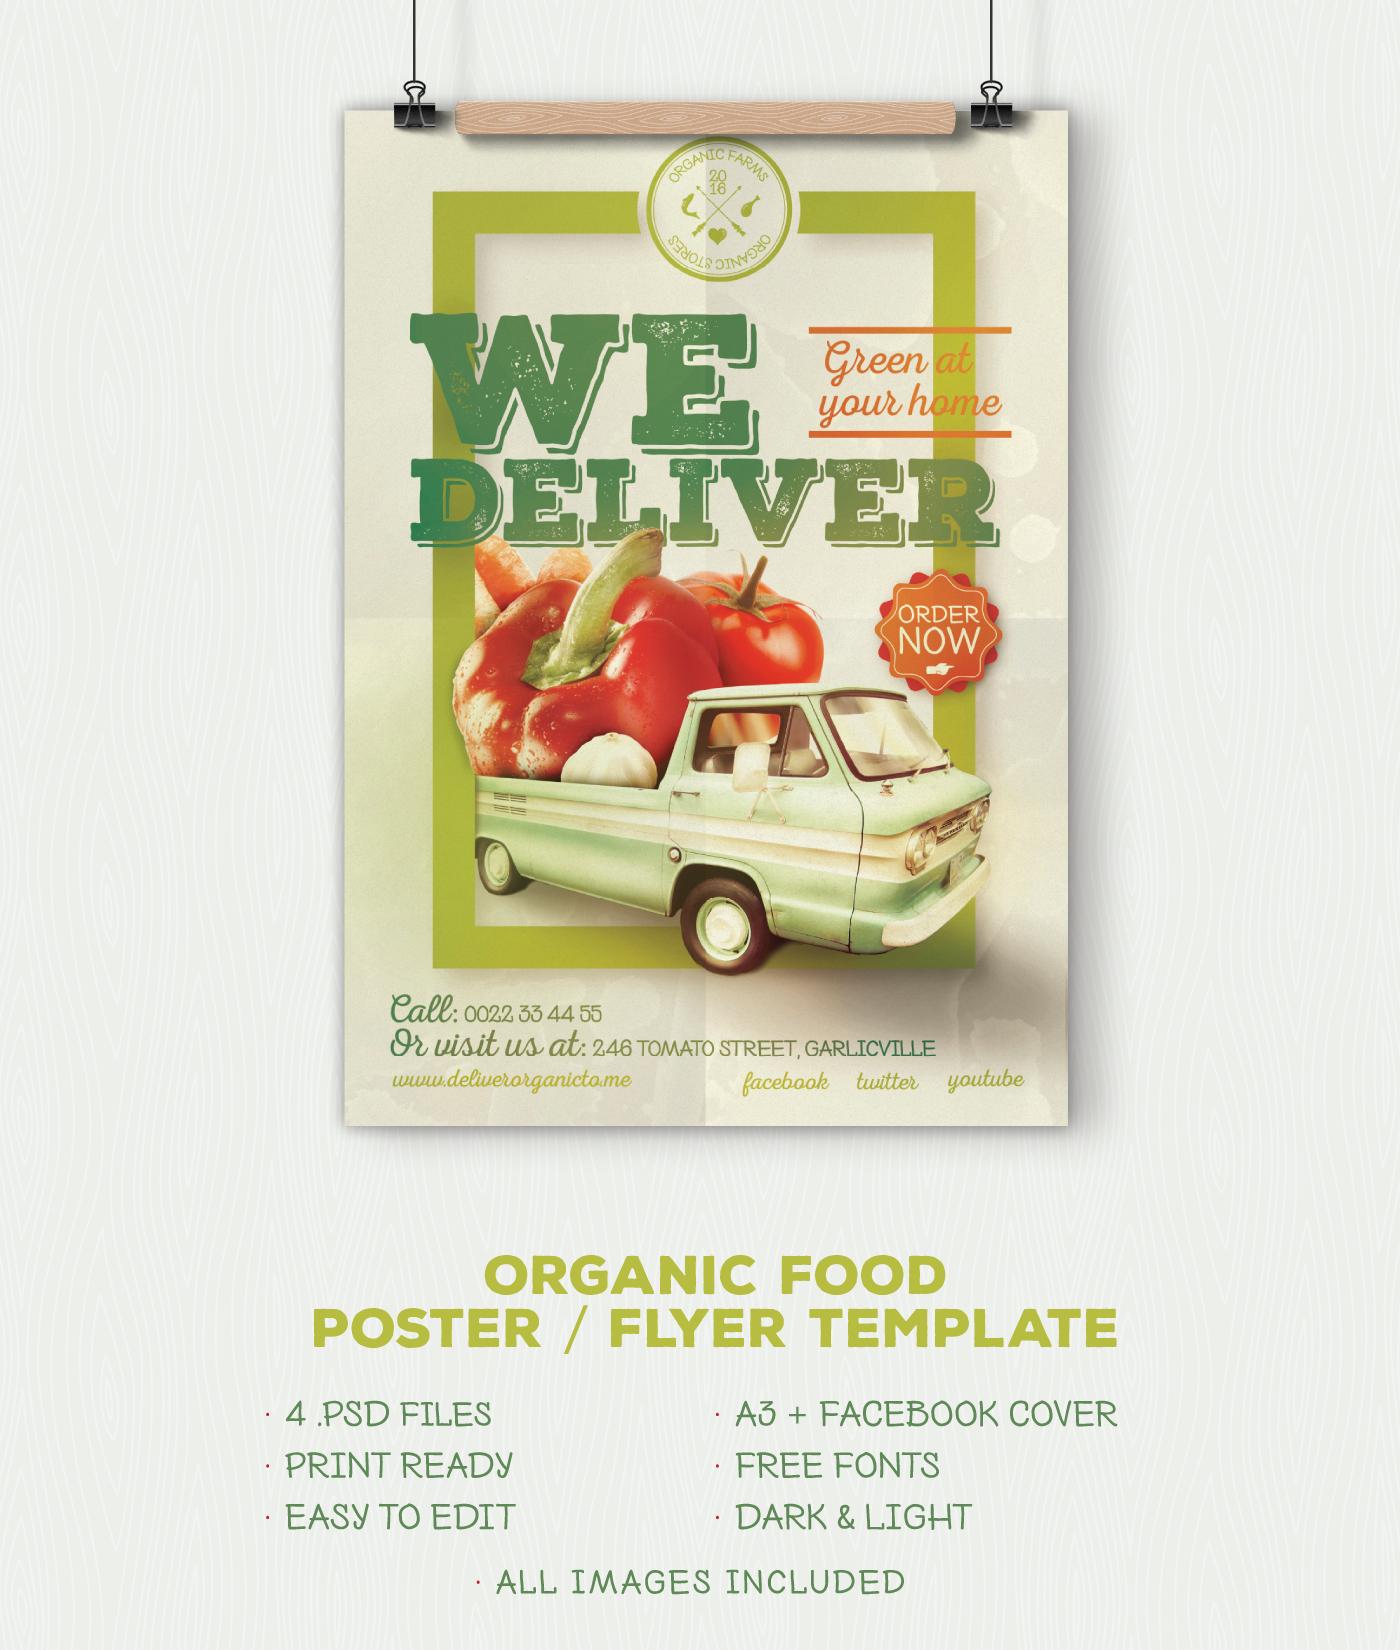 Organic Food Poster Light Version